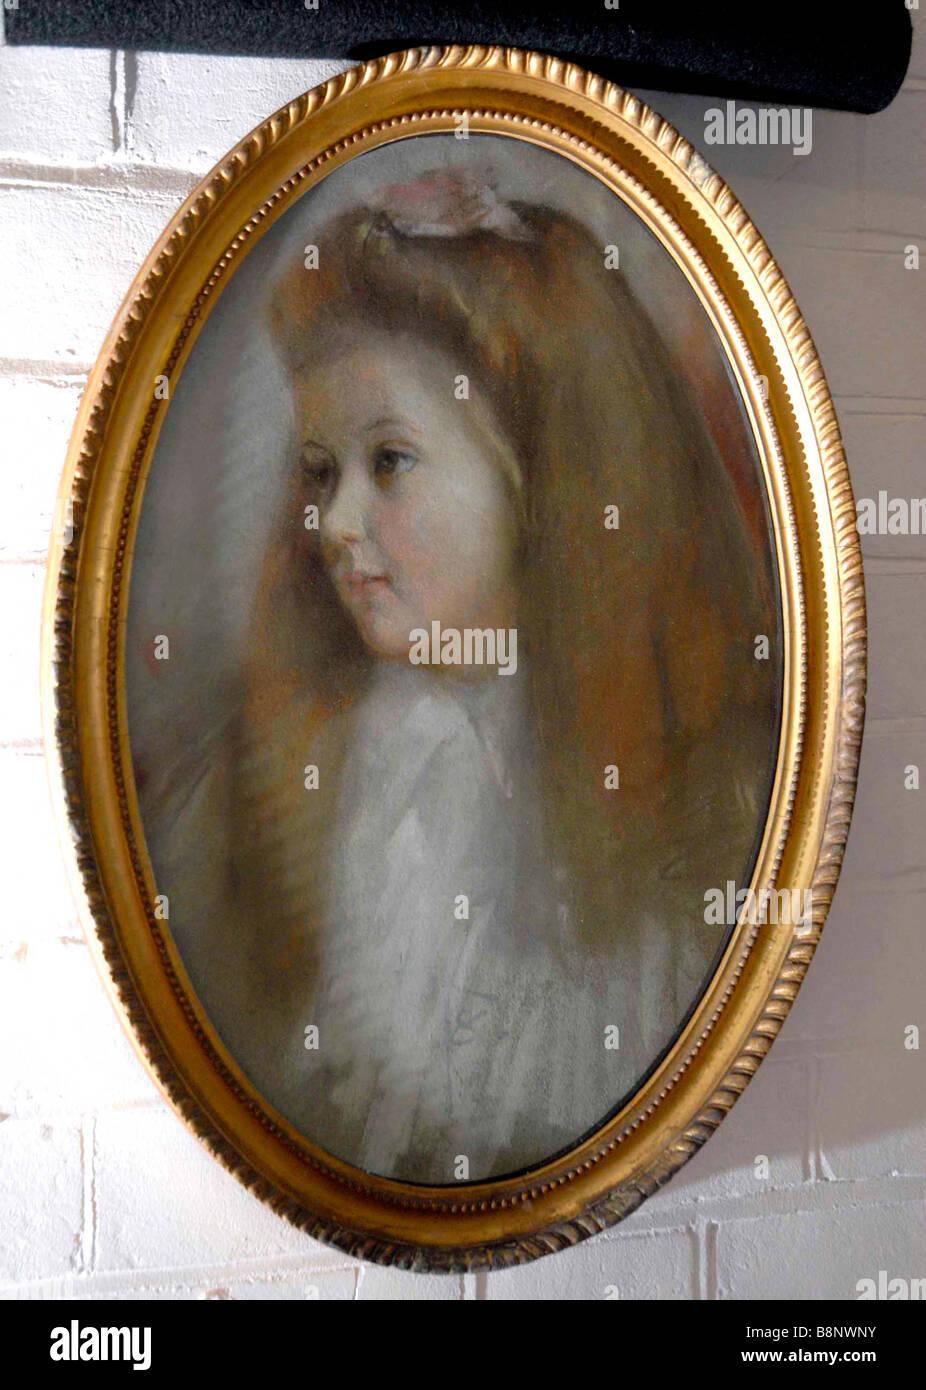 'Tom Roberts' 'pastel drawing' called Goda - Stock Image